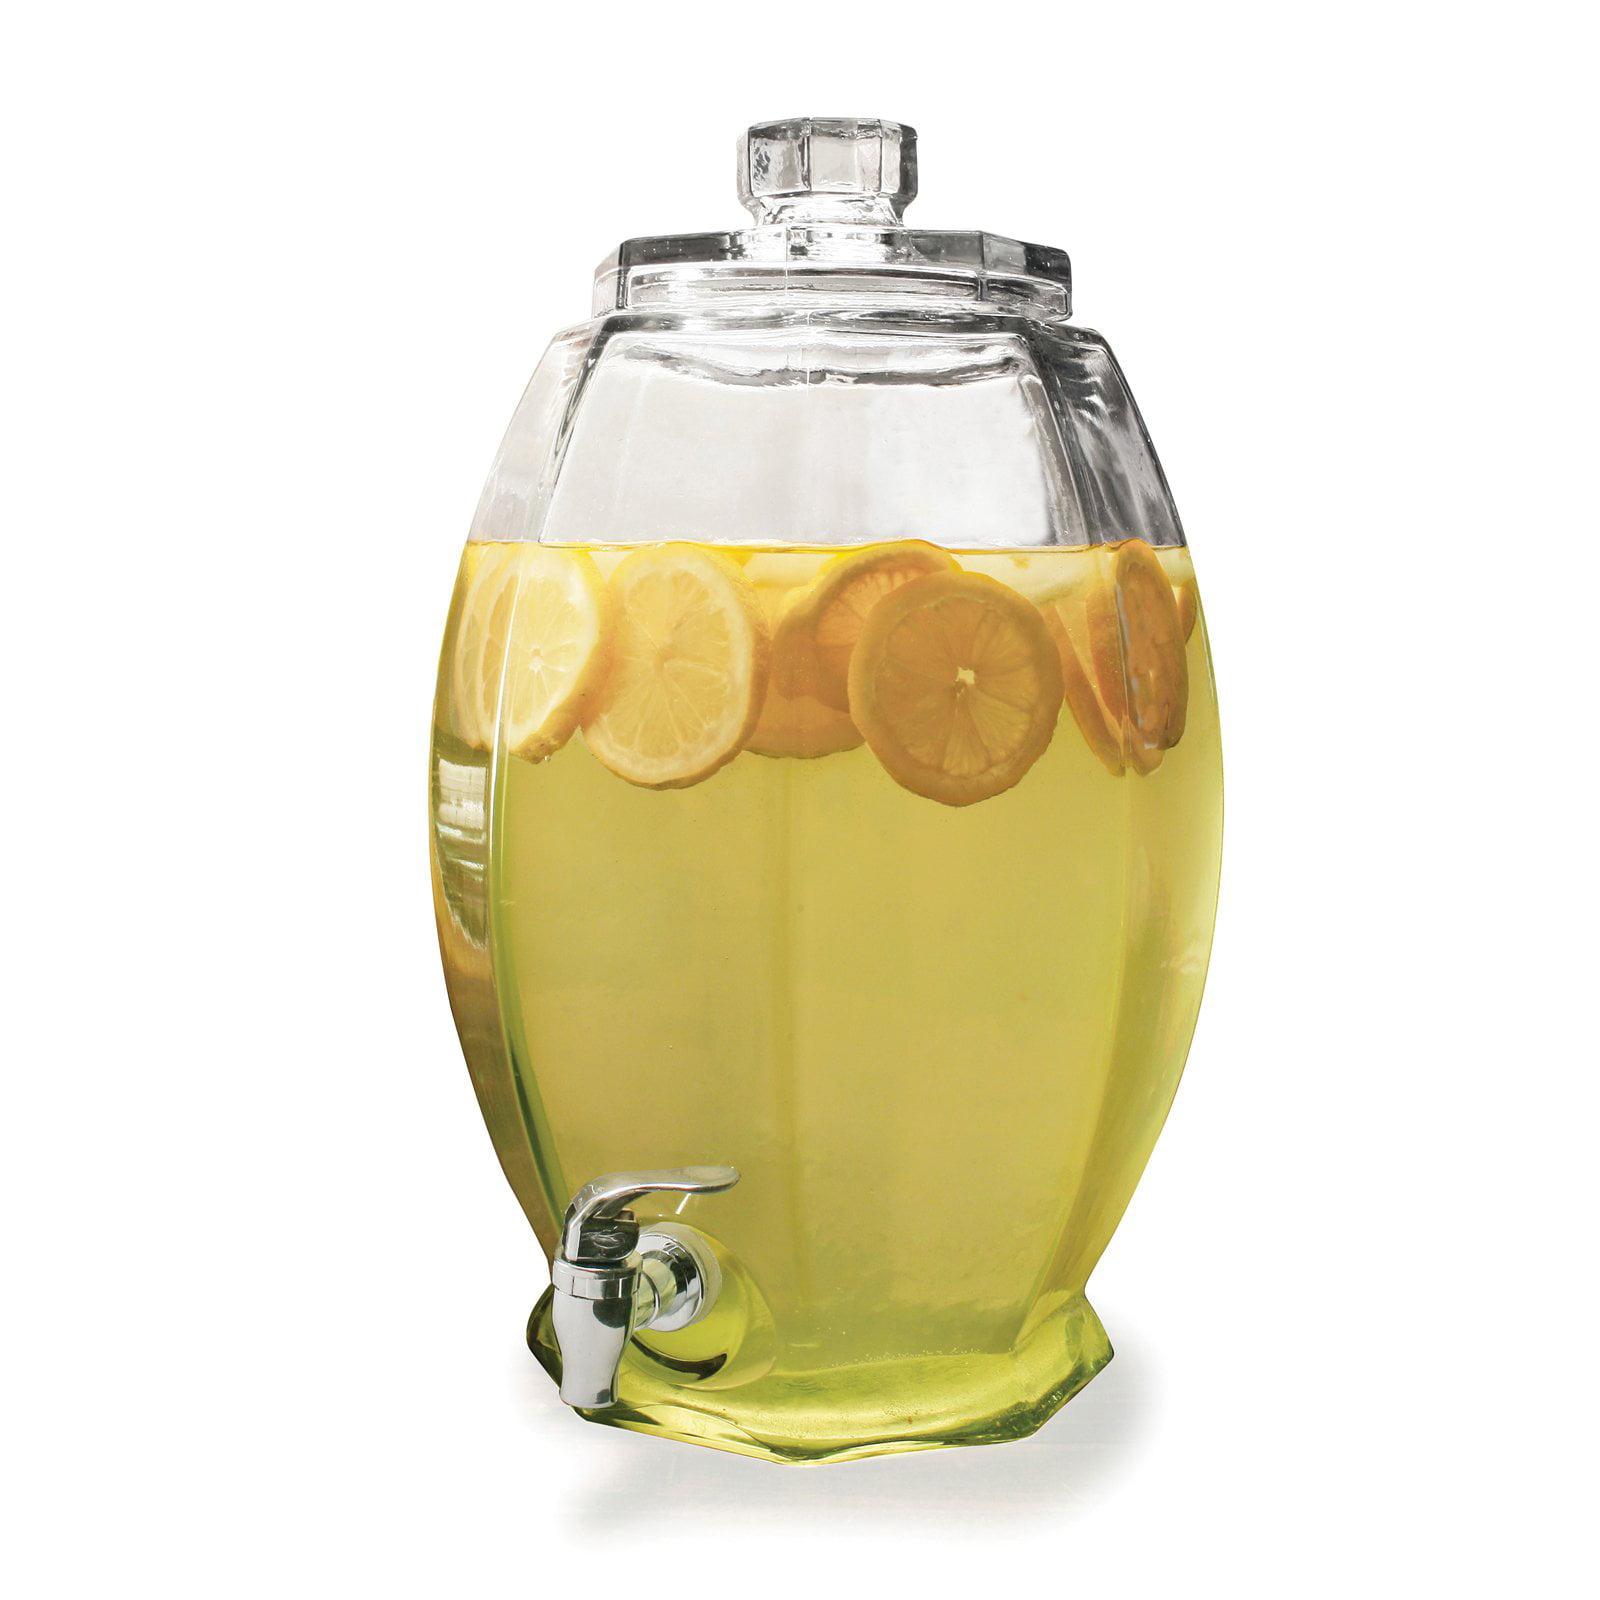 circleware cranston 3-gallon beverage dispenser - walmart